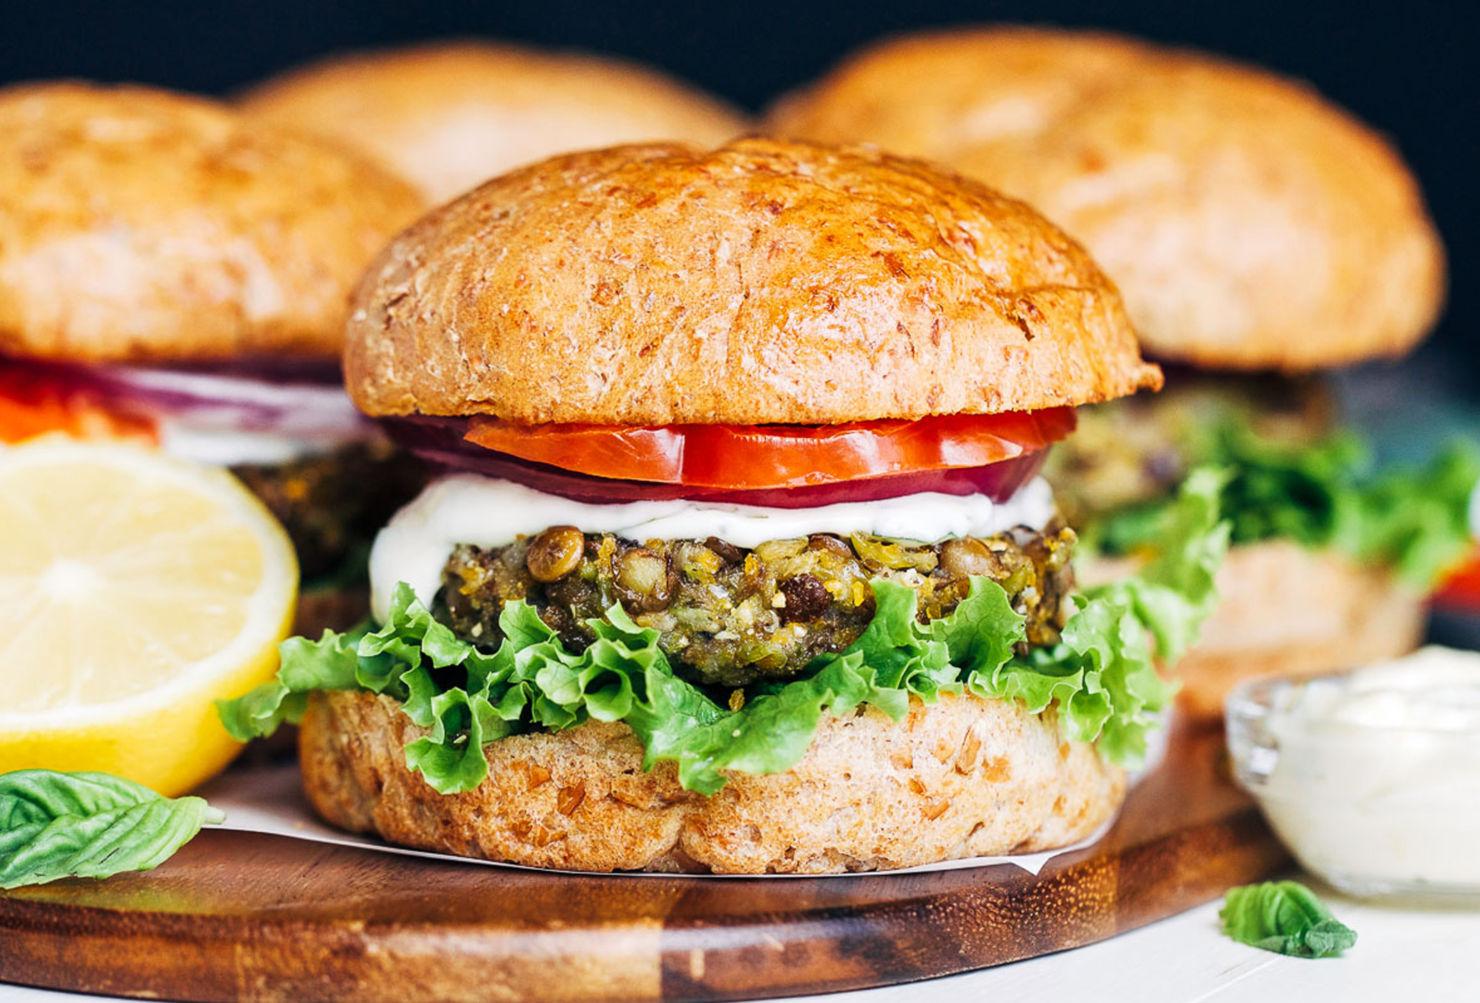 Prepara esta receta vegana a prueba de todos: Hamburguesa de lentejas